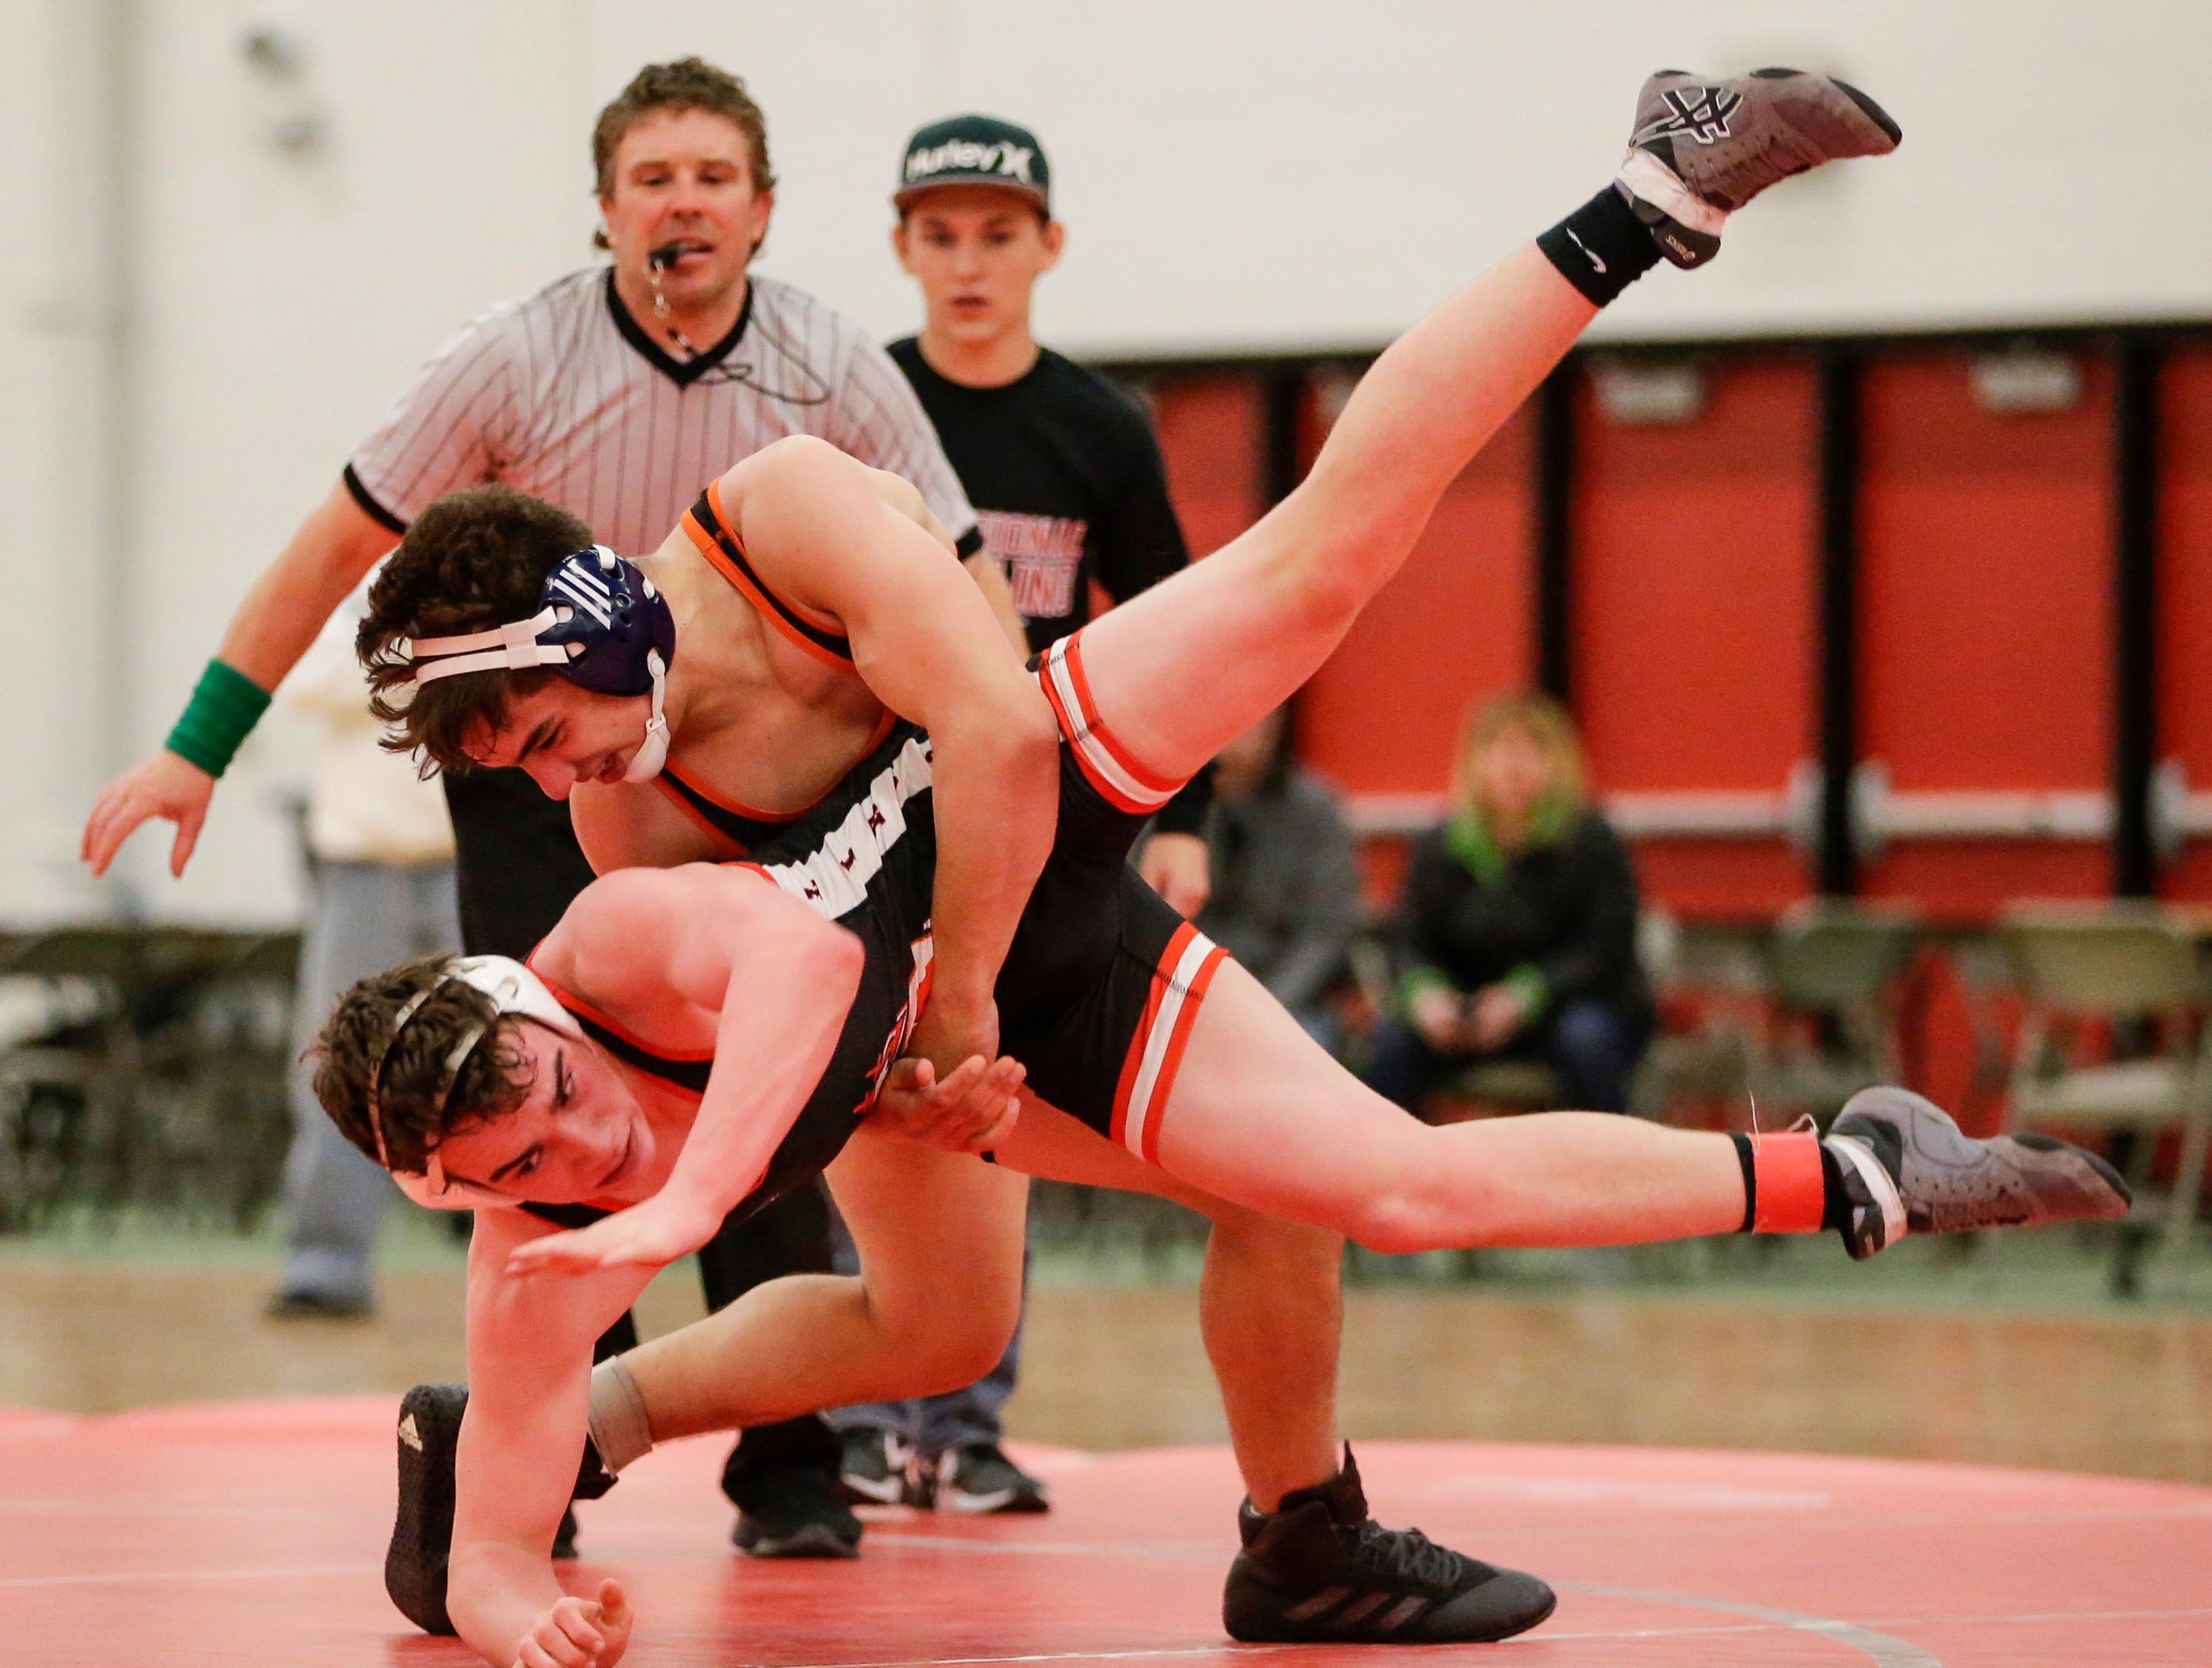 Cedarburg's Benjamin Erickson wrestles Manitowoc Lincoln's Trevor DeBruin in the 160 weight class during the WIAA D1 Regionals at Manitowoc Lincoln High School Saturday, February 9, 2019, in Manitowoc, Wis. Joshua Clark/USA TODAY NETWORK-Wisconsin